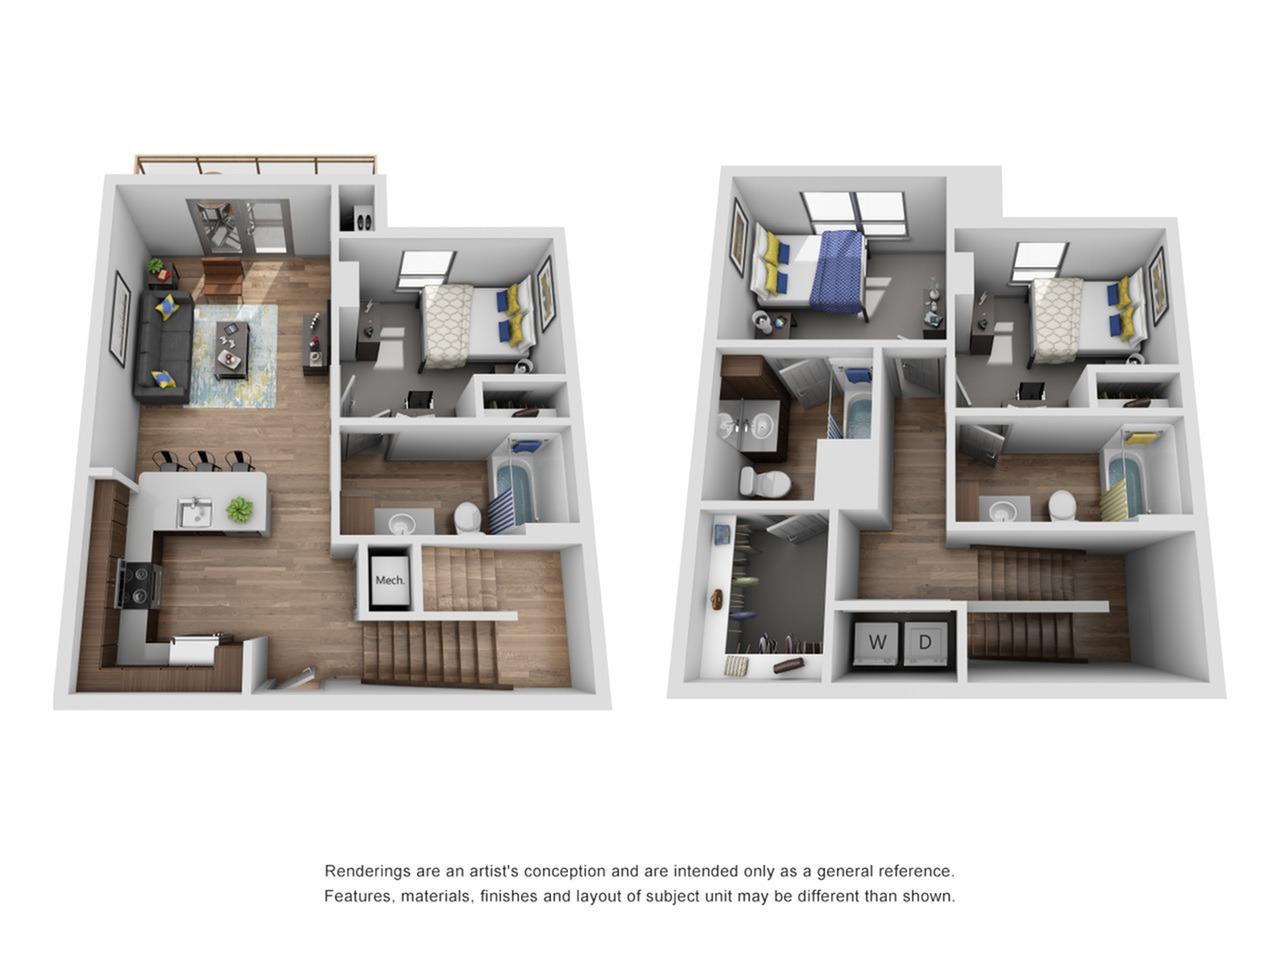 3 bedroom town house in ann arbor